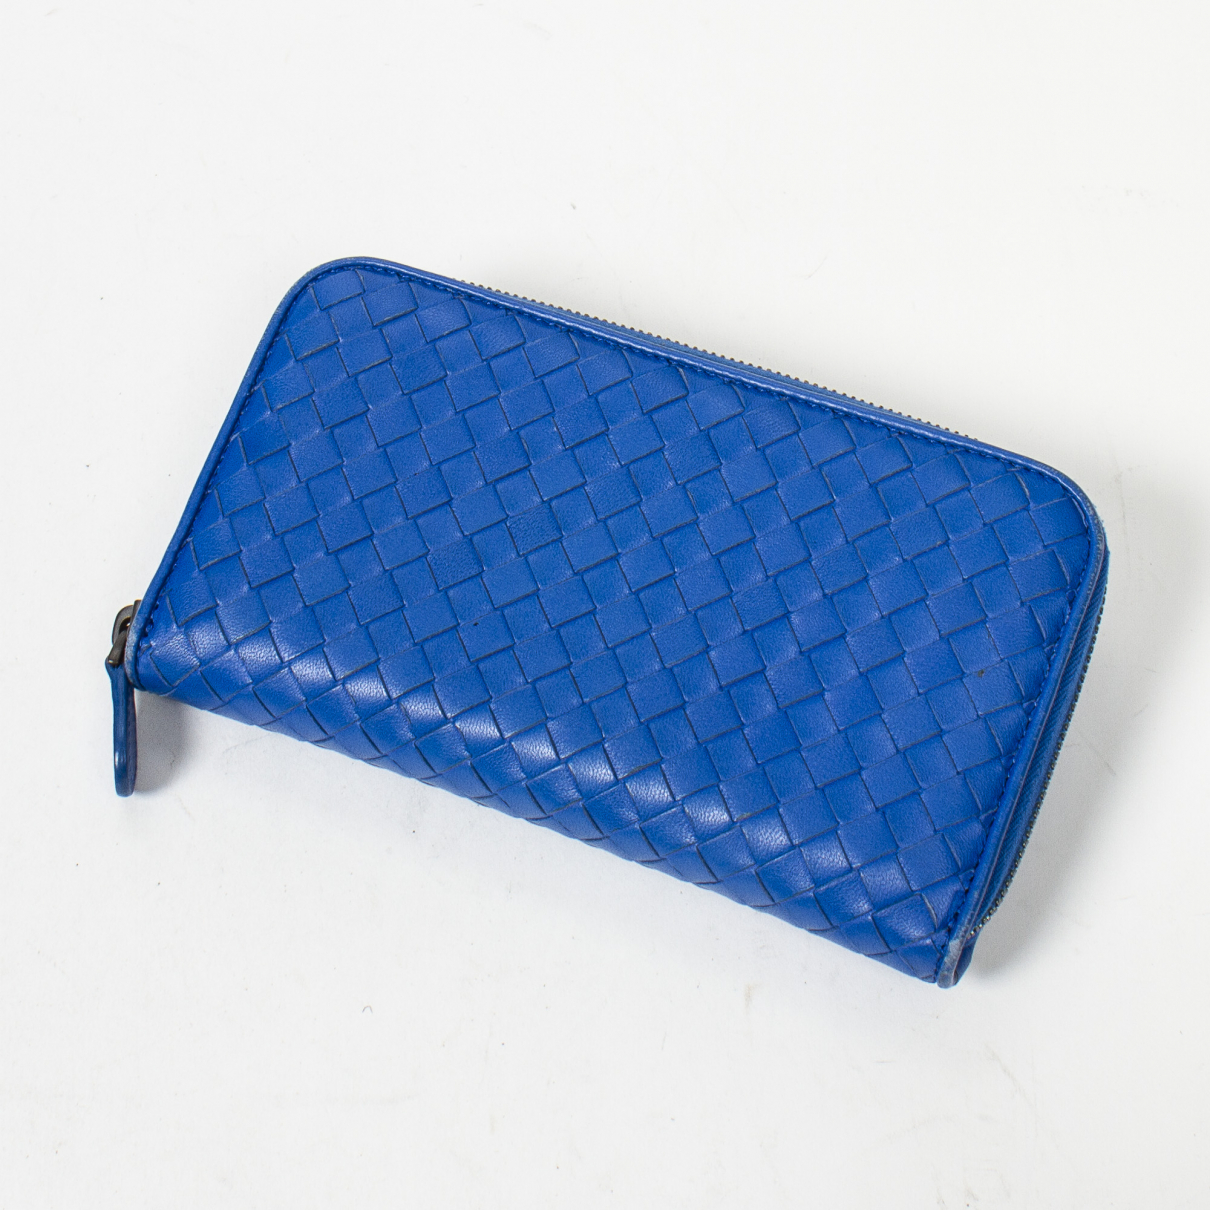 Bottega Veneta Intrecciato Blue wallet for Women \N